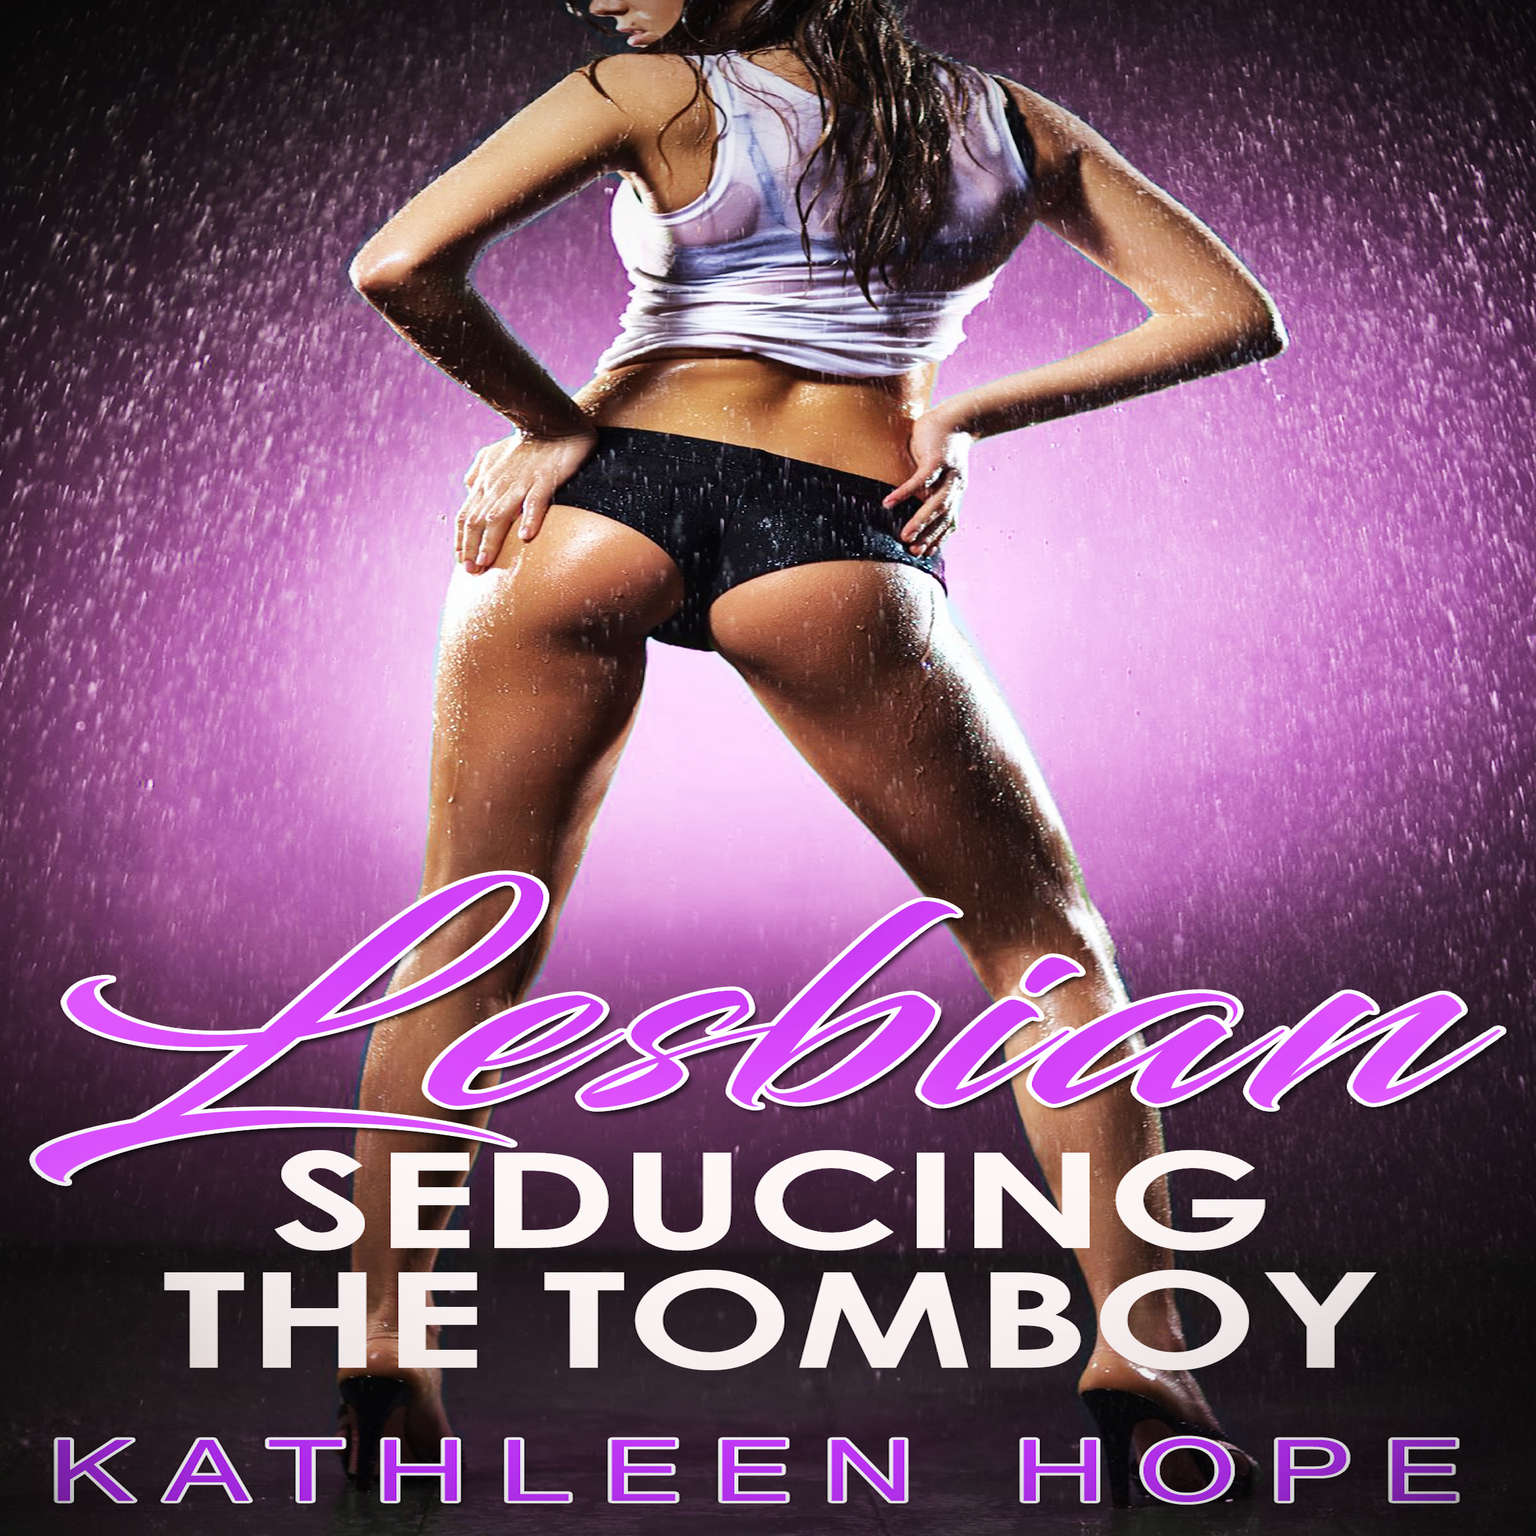 Lesbian: Seducing the Tomboy Audiobook, by Kathleen Hope